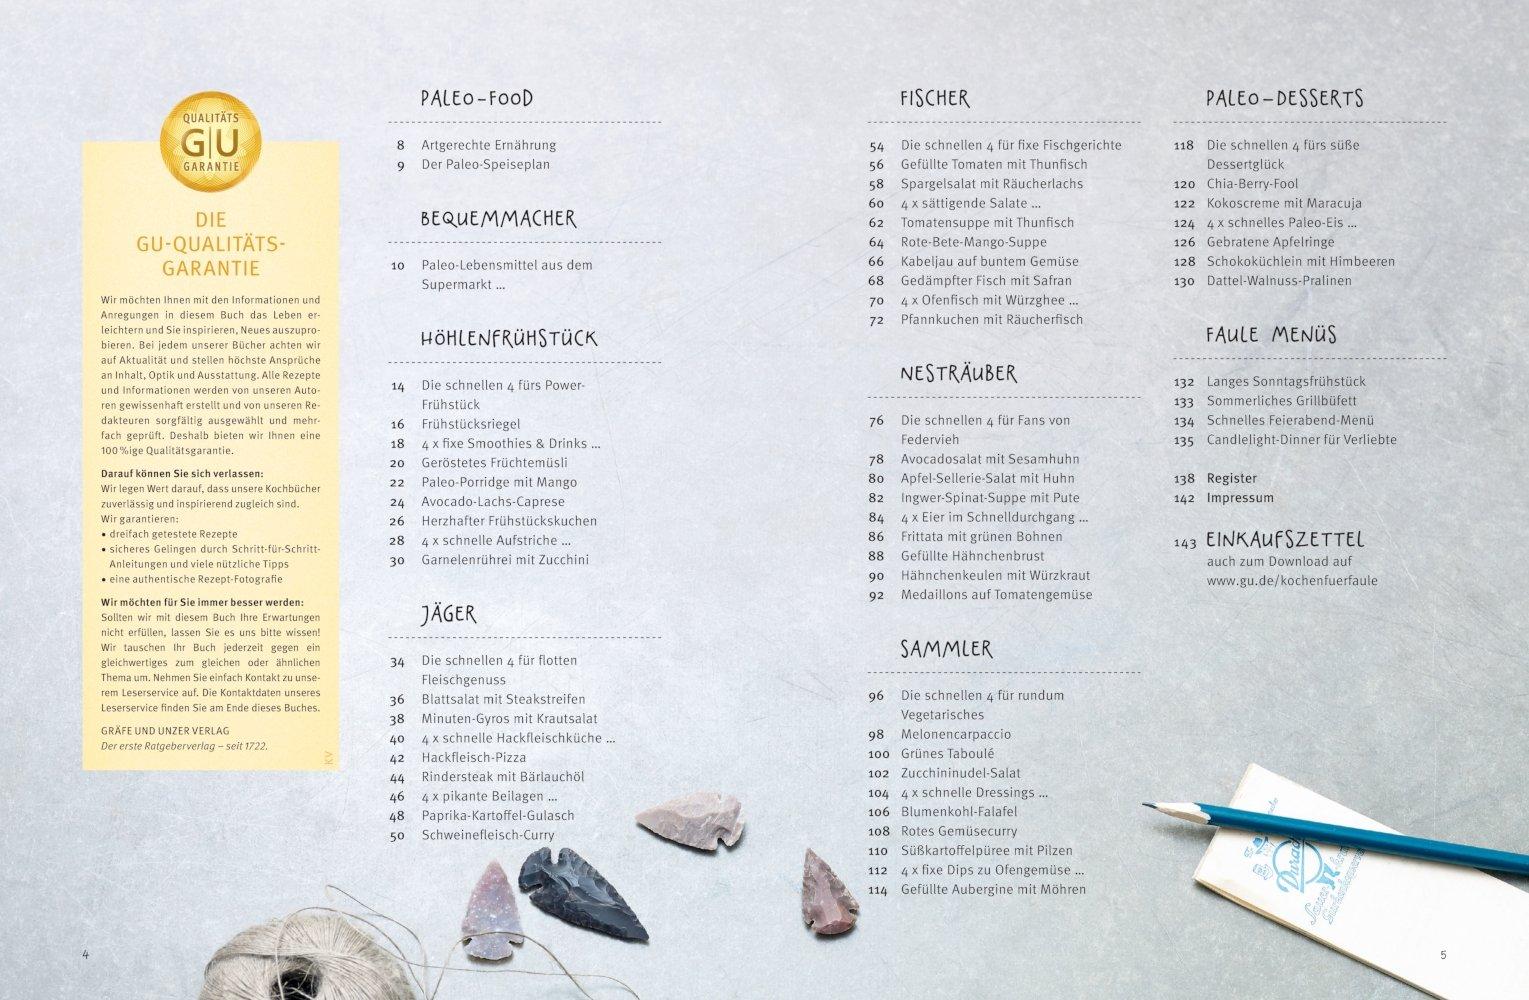 Paleo für Faule: Amazon.es: Martin Kintrup: Libros en idiomas extranjeros